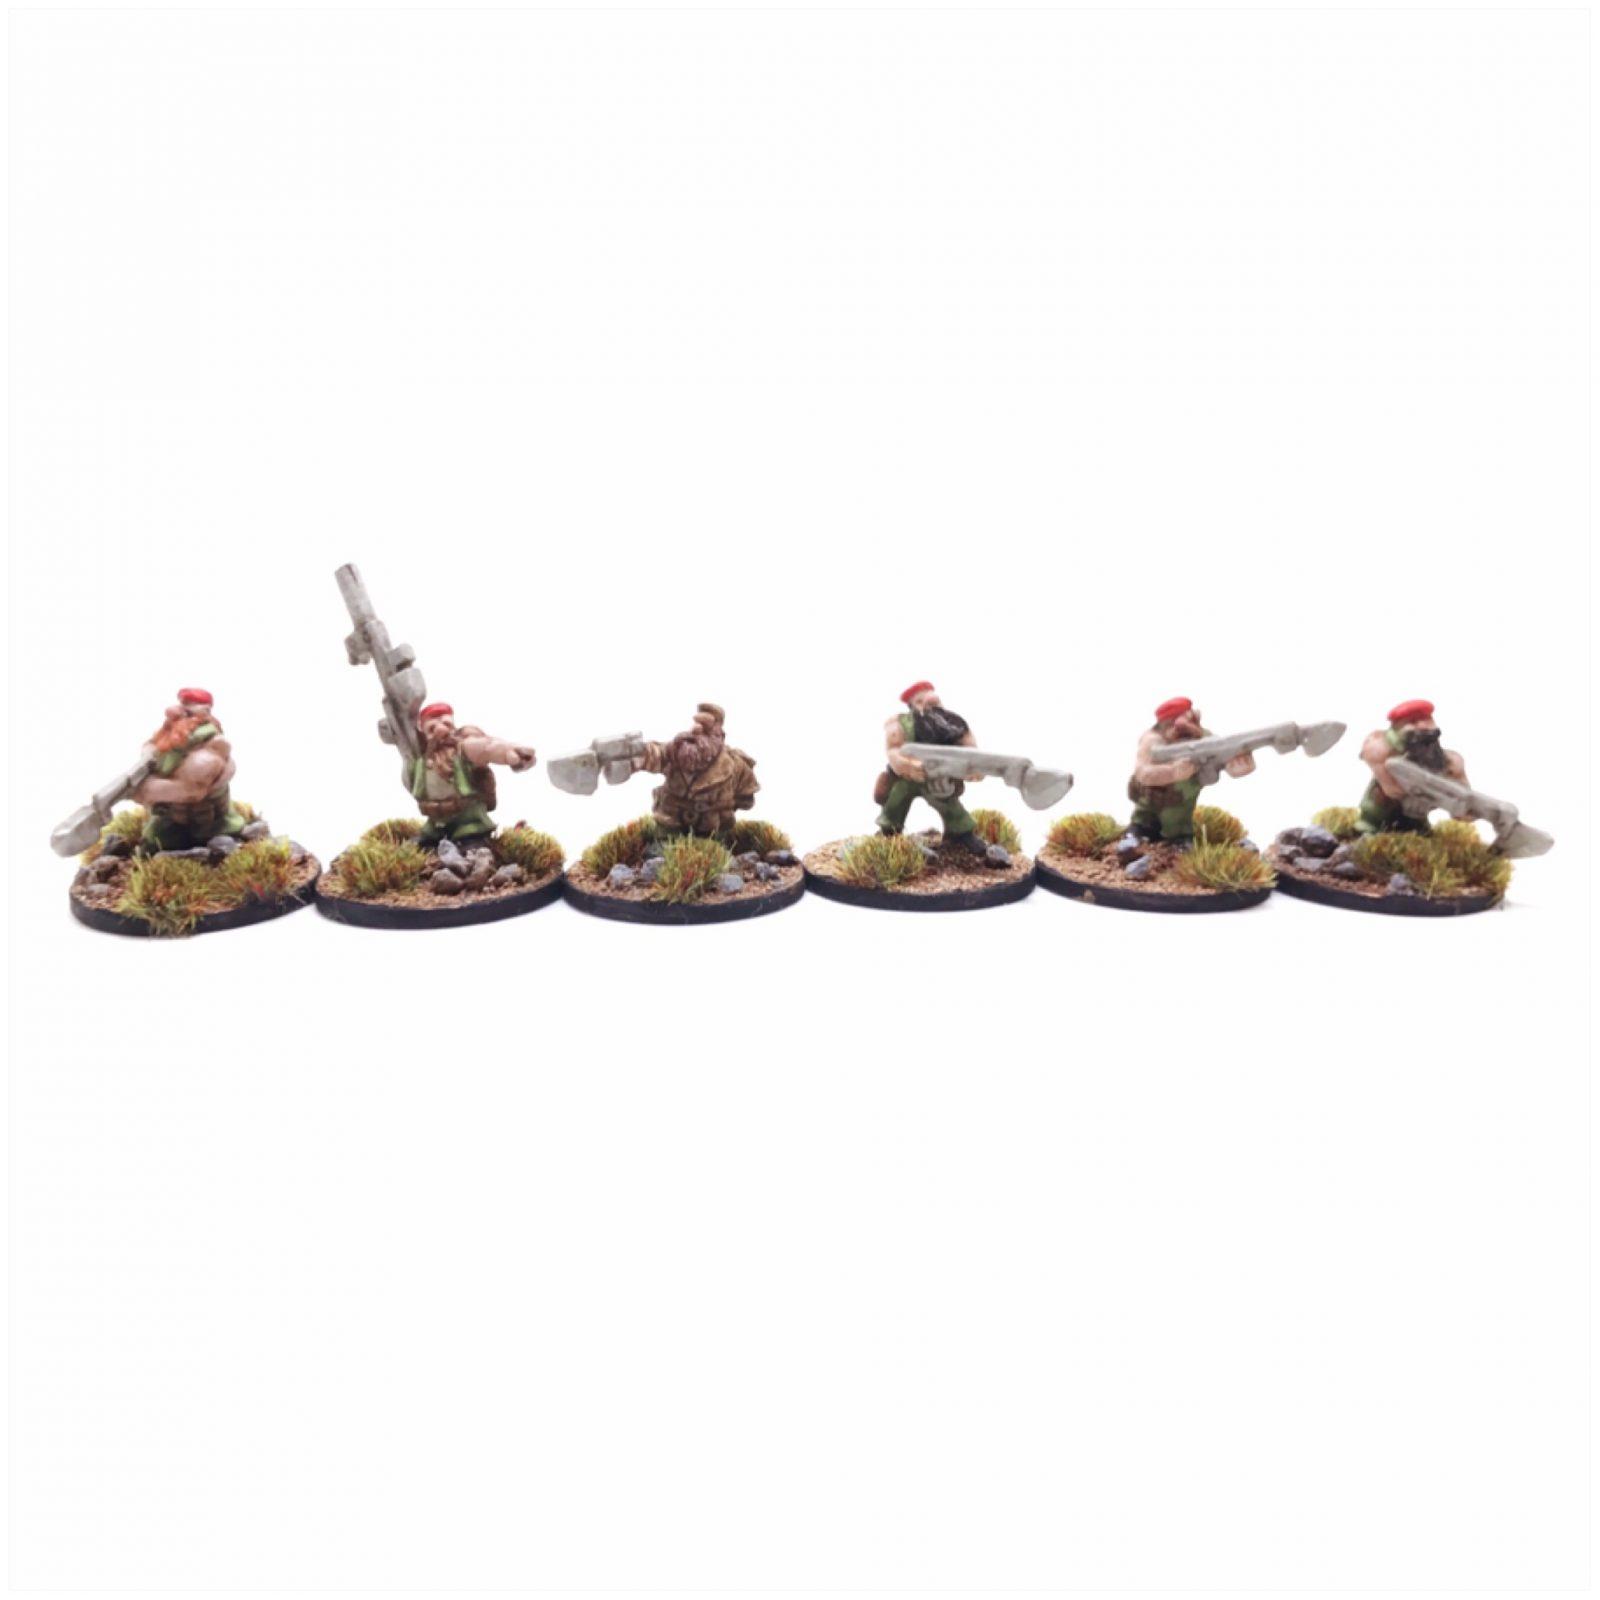 Dwarf Clansmen Command – Pack 1